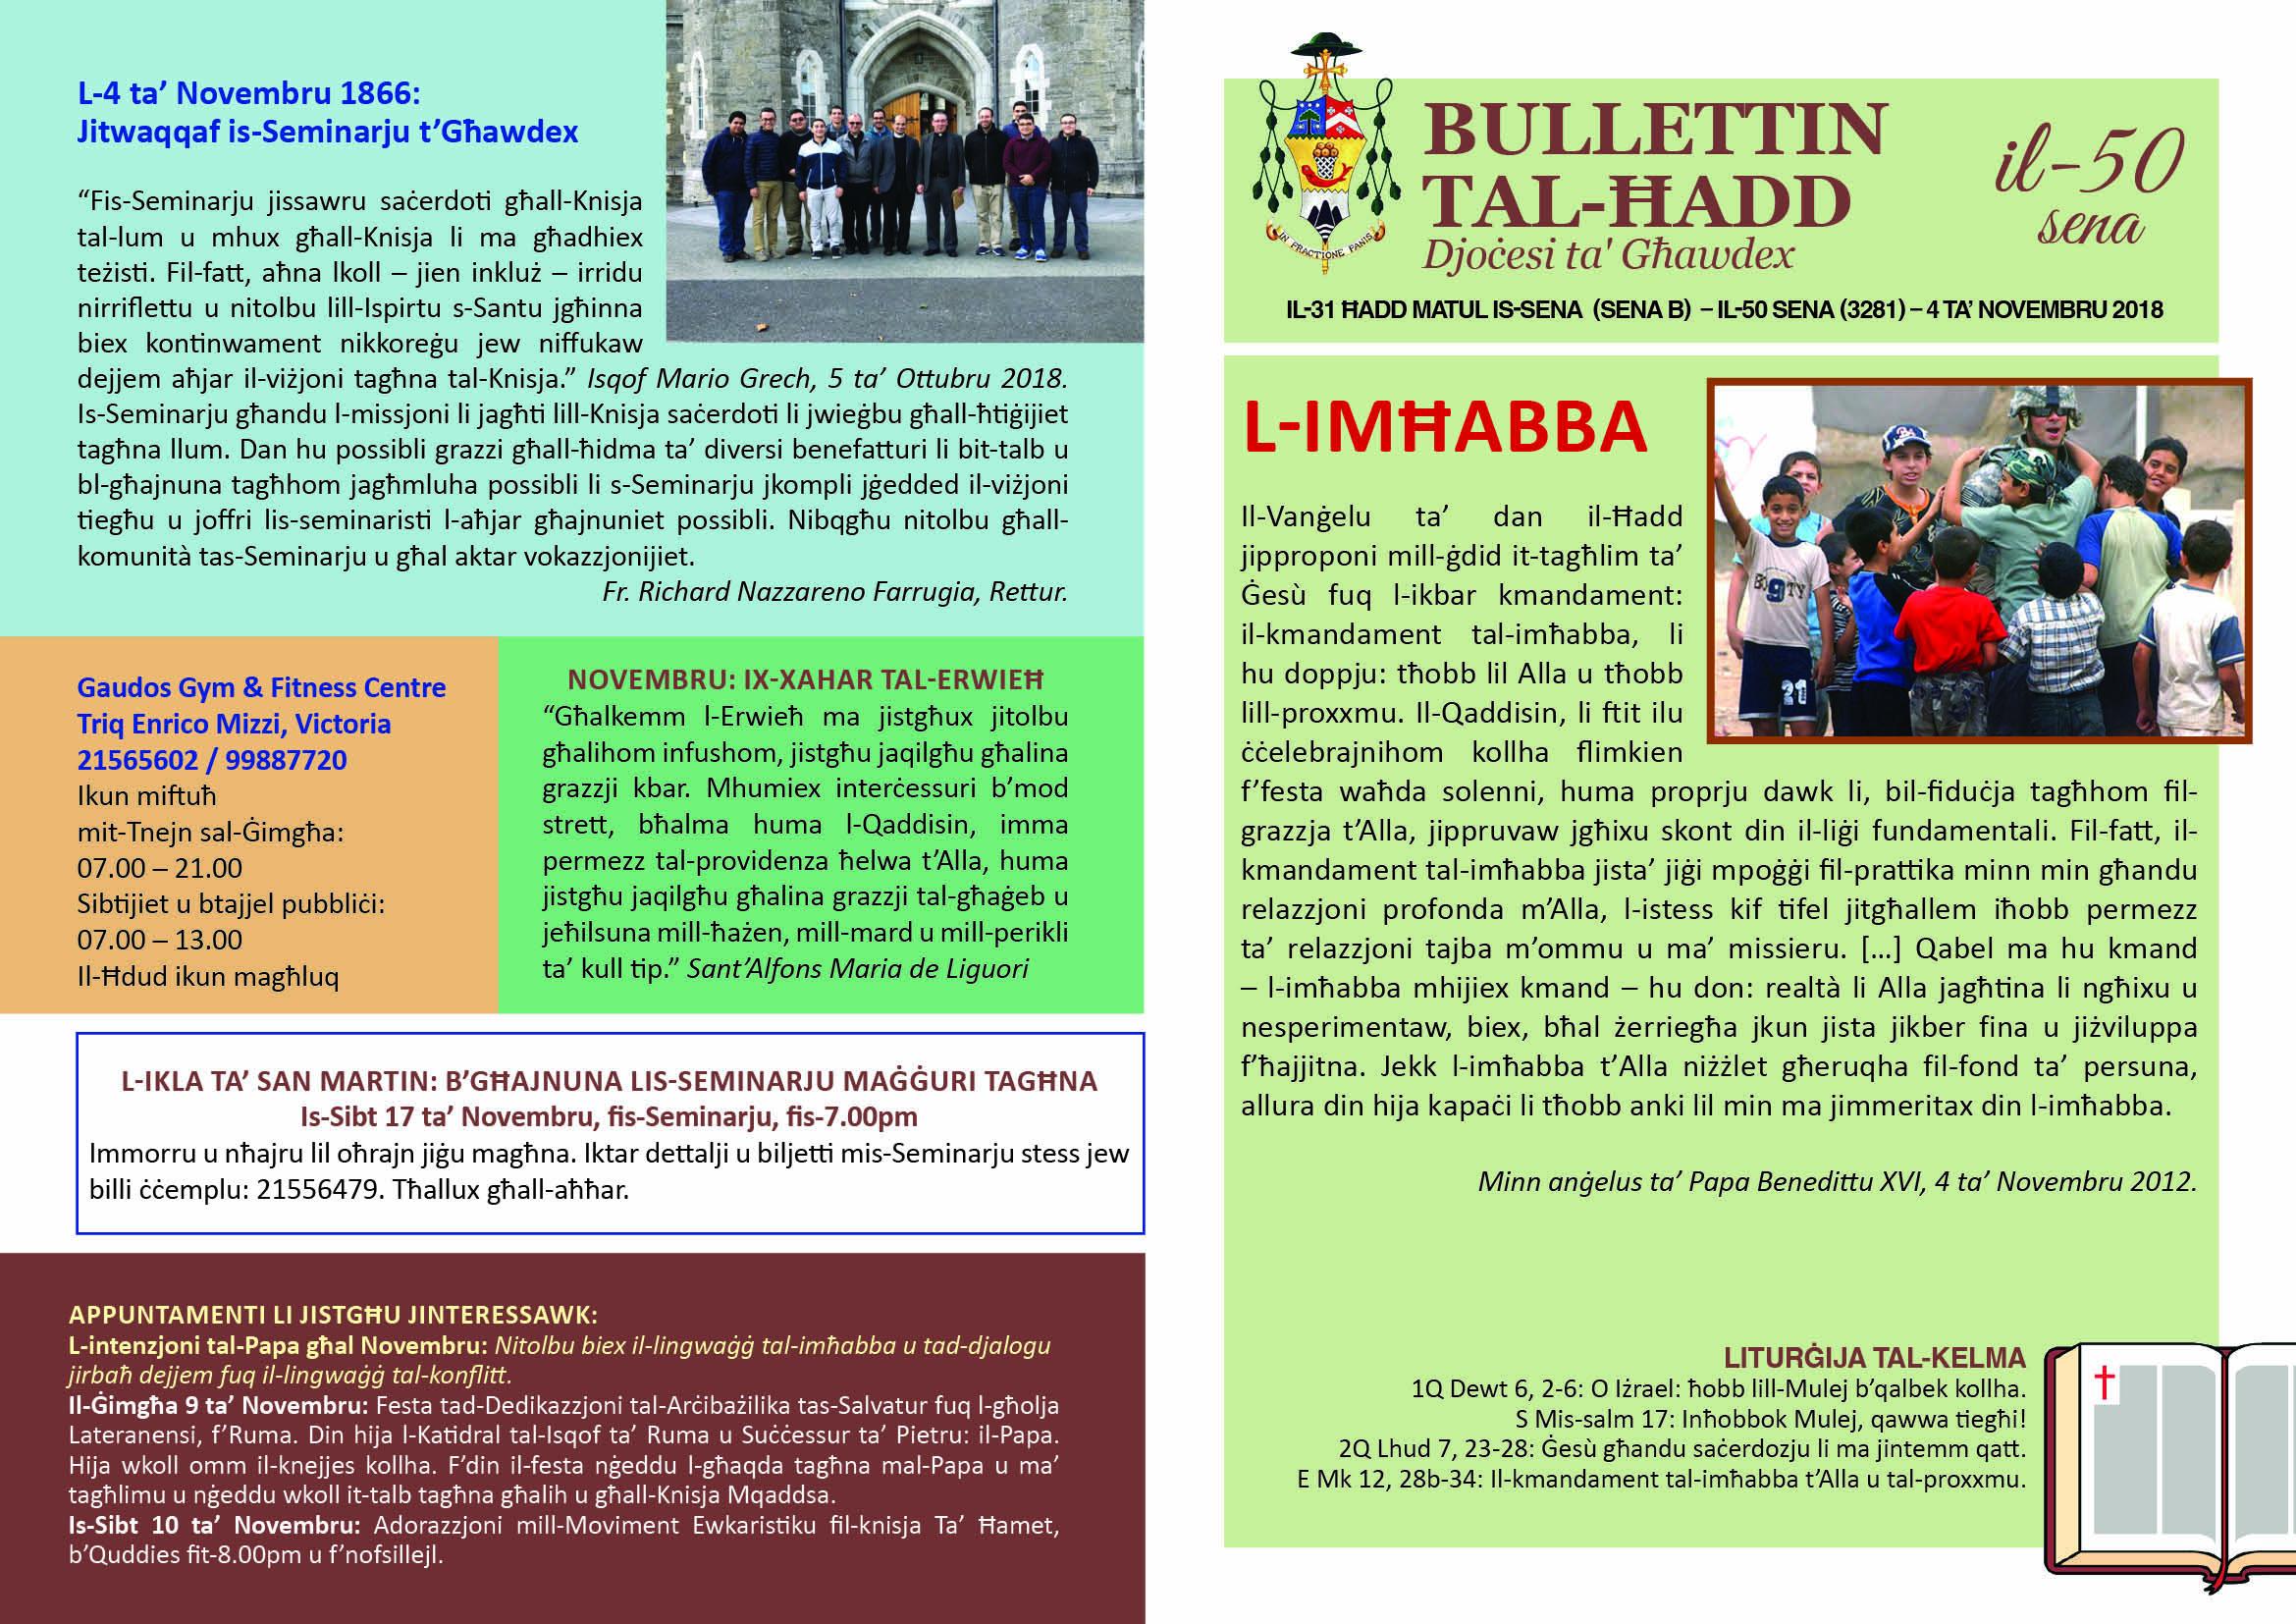 bullettin-2018-novembru-04.jpg